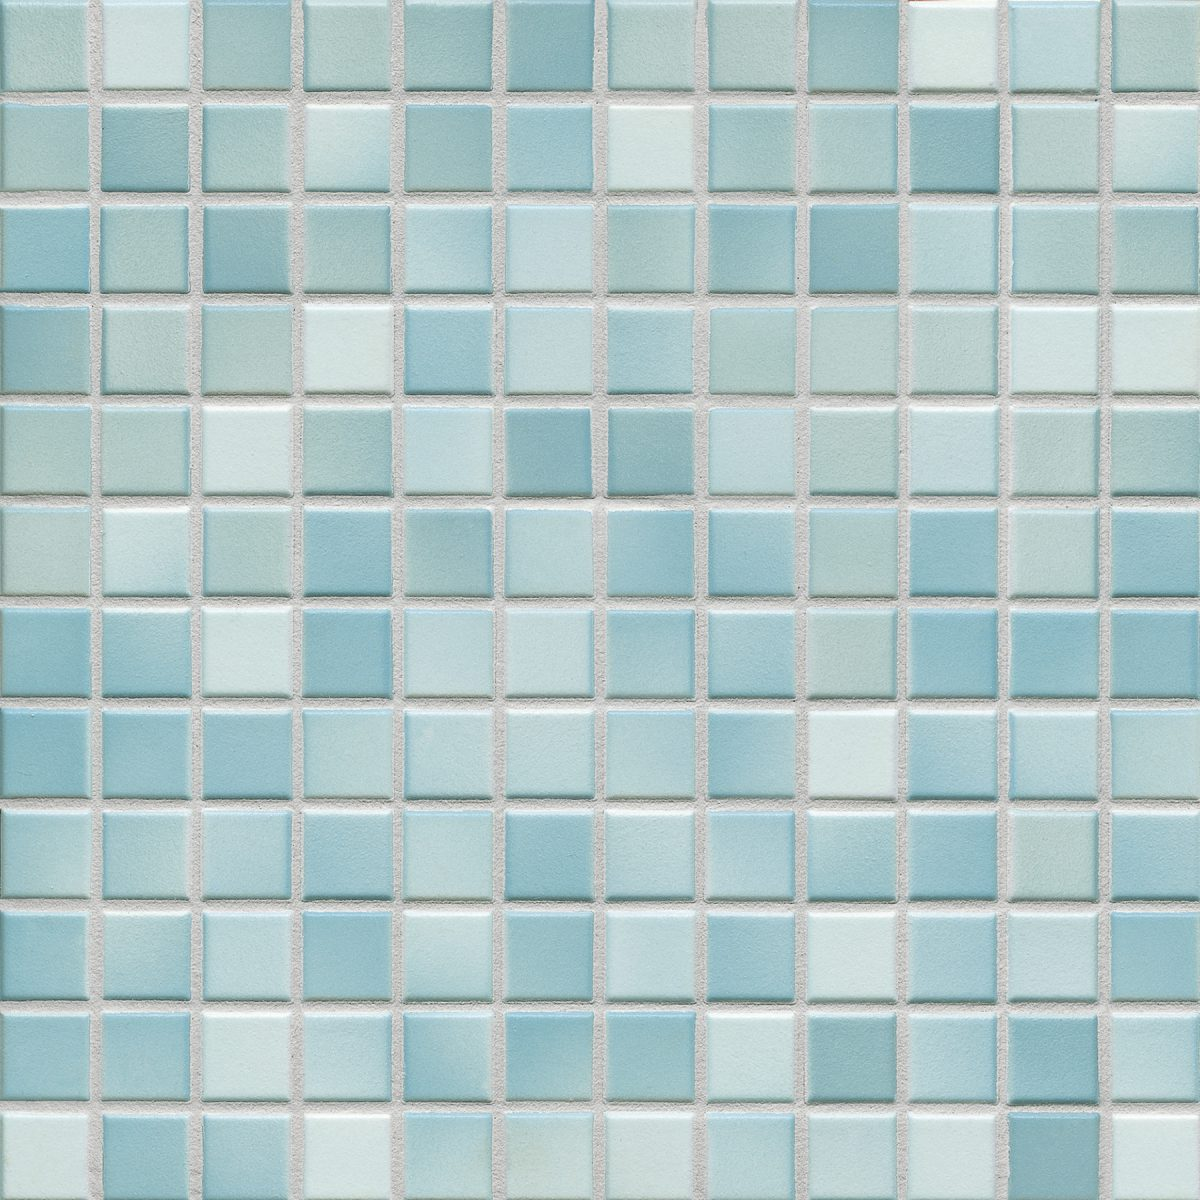 Мозаика серия Fresh 2,4 X 2,4 см Light Blue Mix Secura (противоскользящая R10/B)